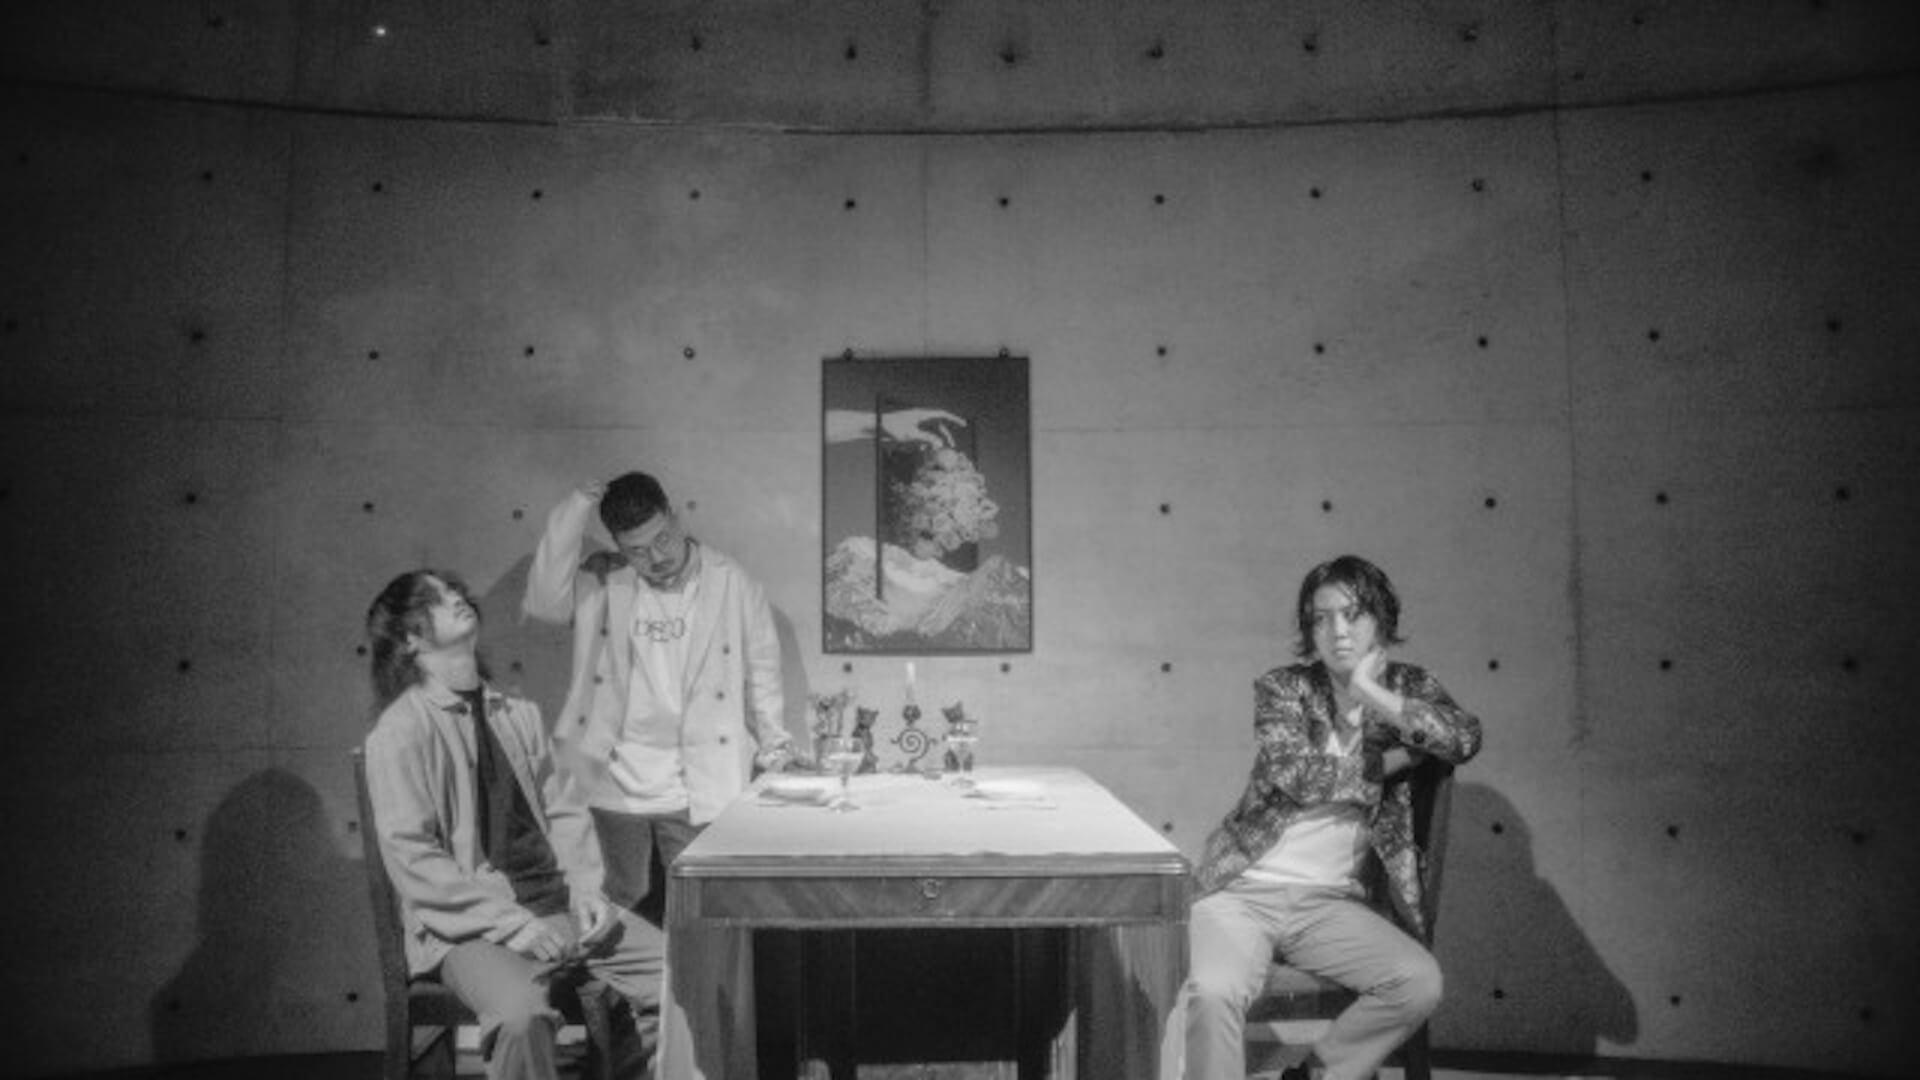 <YABITO FESTIVAL 2020>がおおばキャンプ村で開催決定!第1弾出演アーティストにKan Sano、MÖSHIら4組 music200831_yabito_3